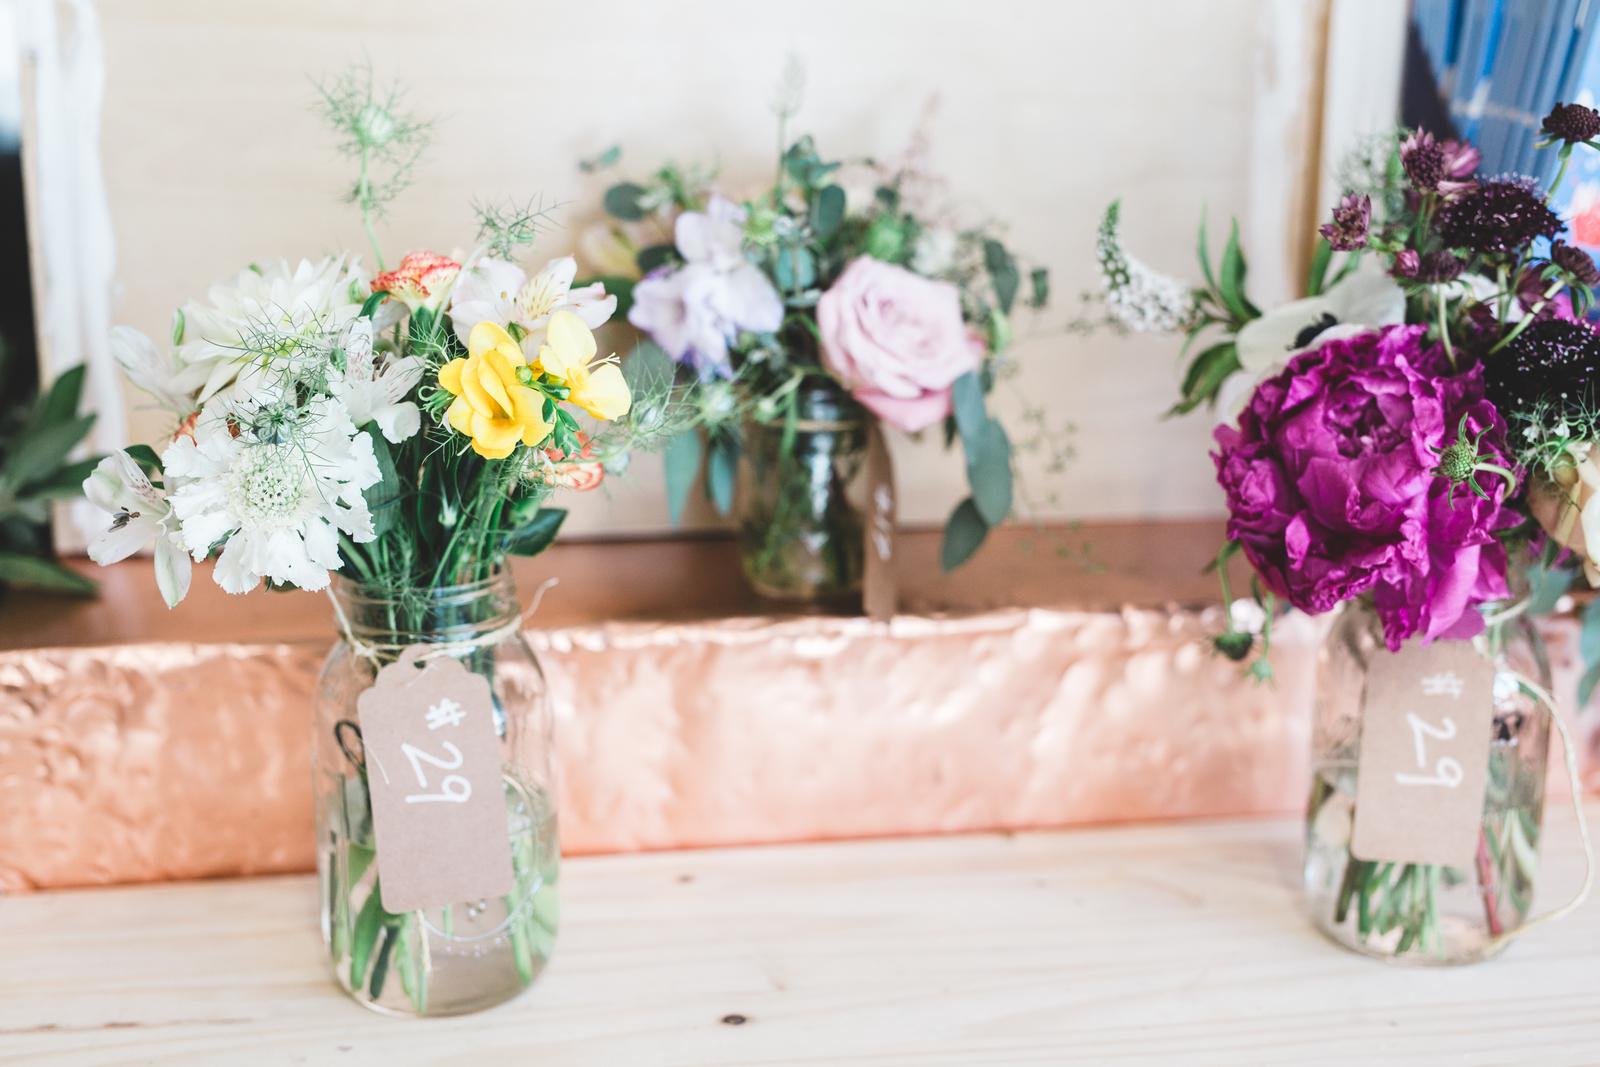 Post wedding anxiety